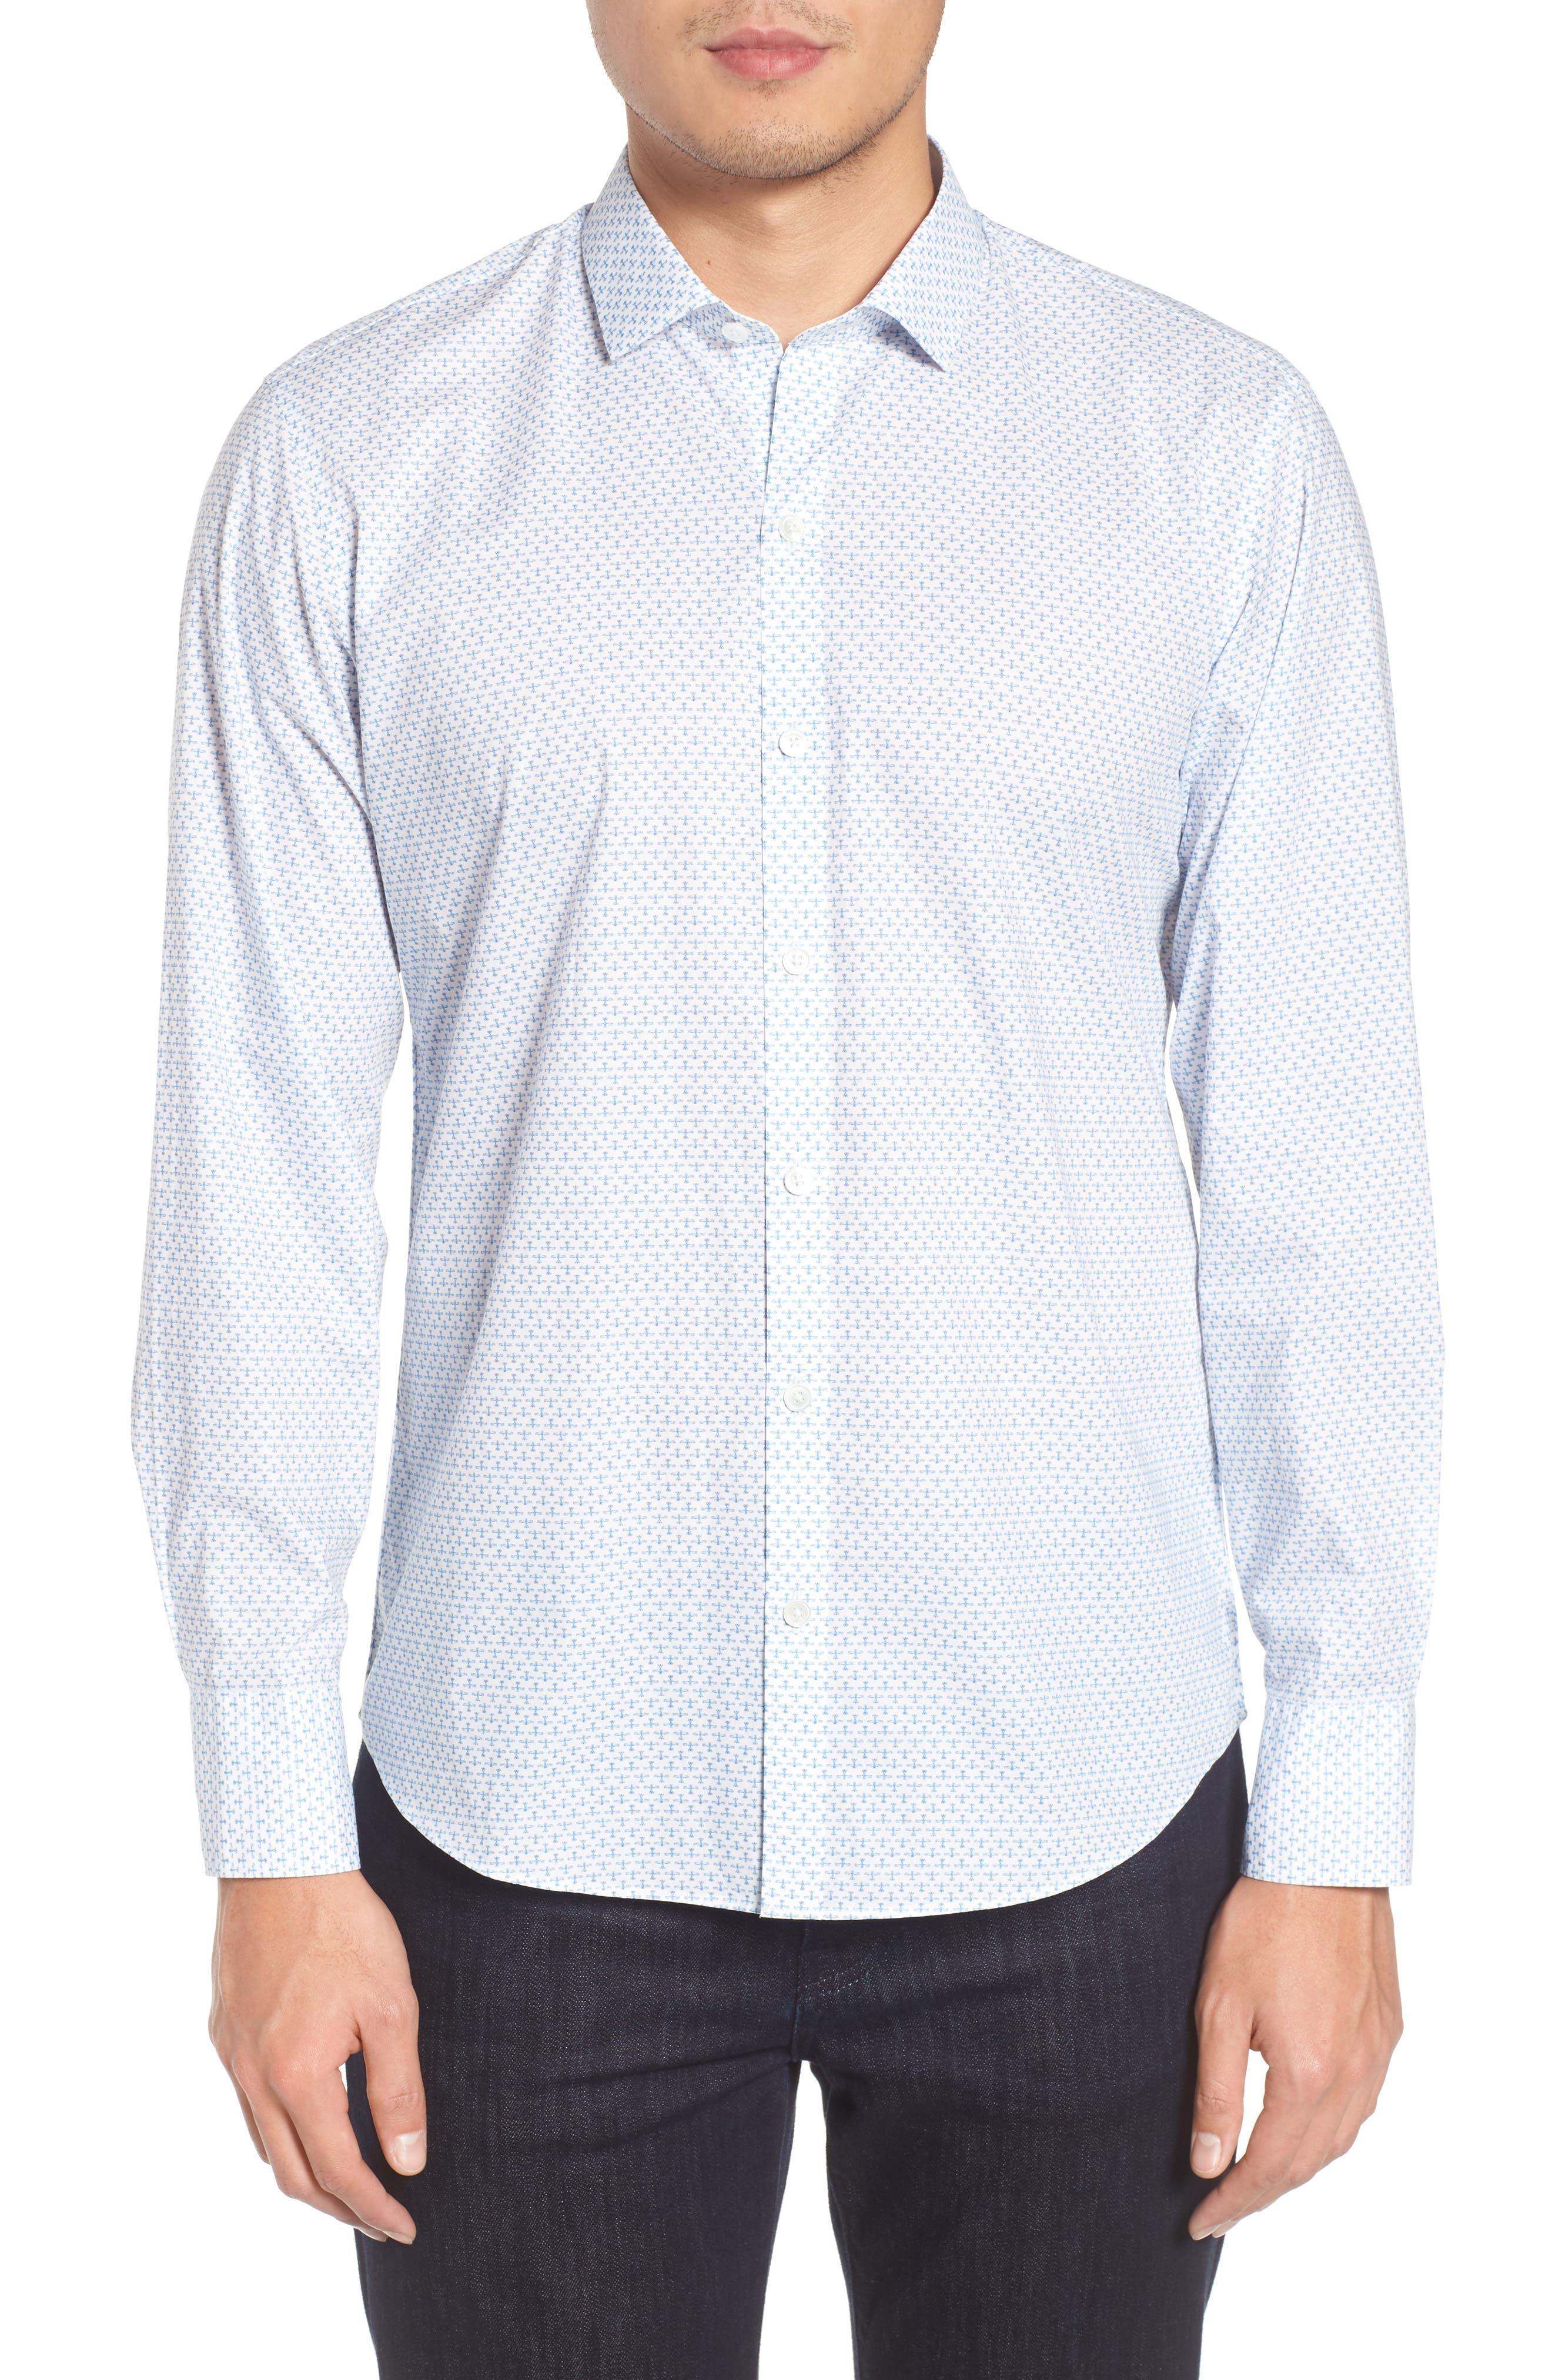 Korey Airplane Print Sport Shirt,                         Main,                         color, White